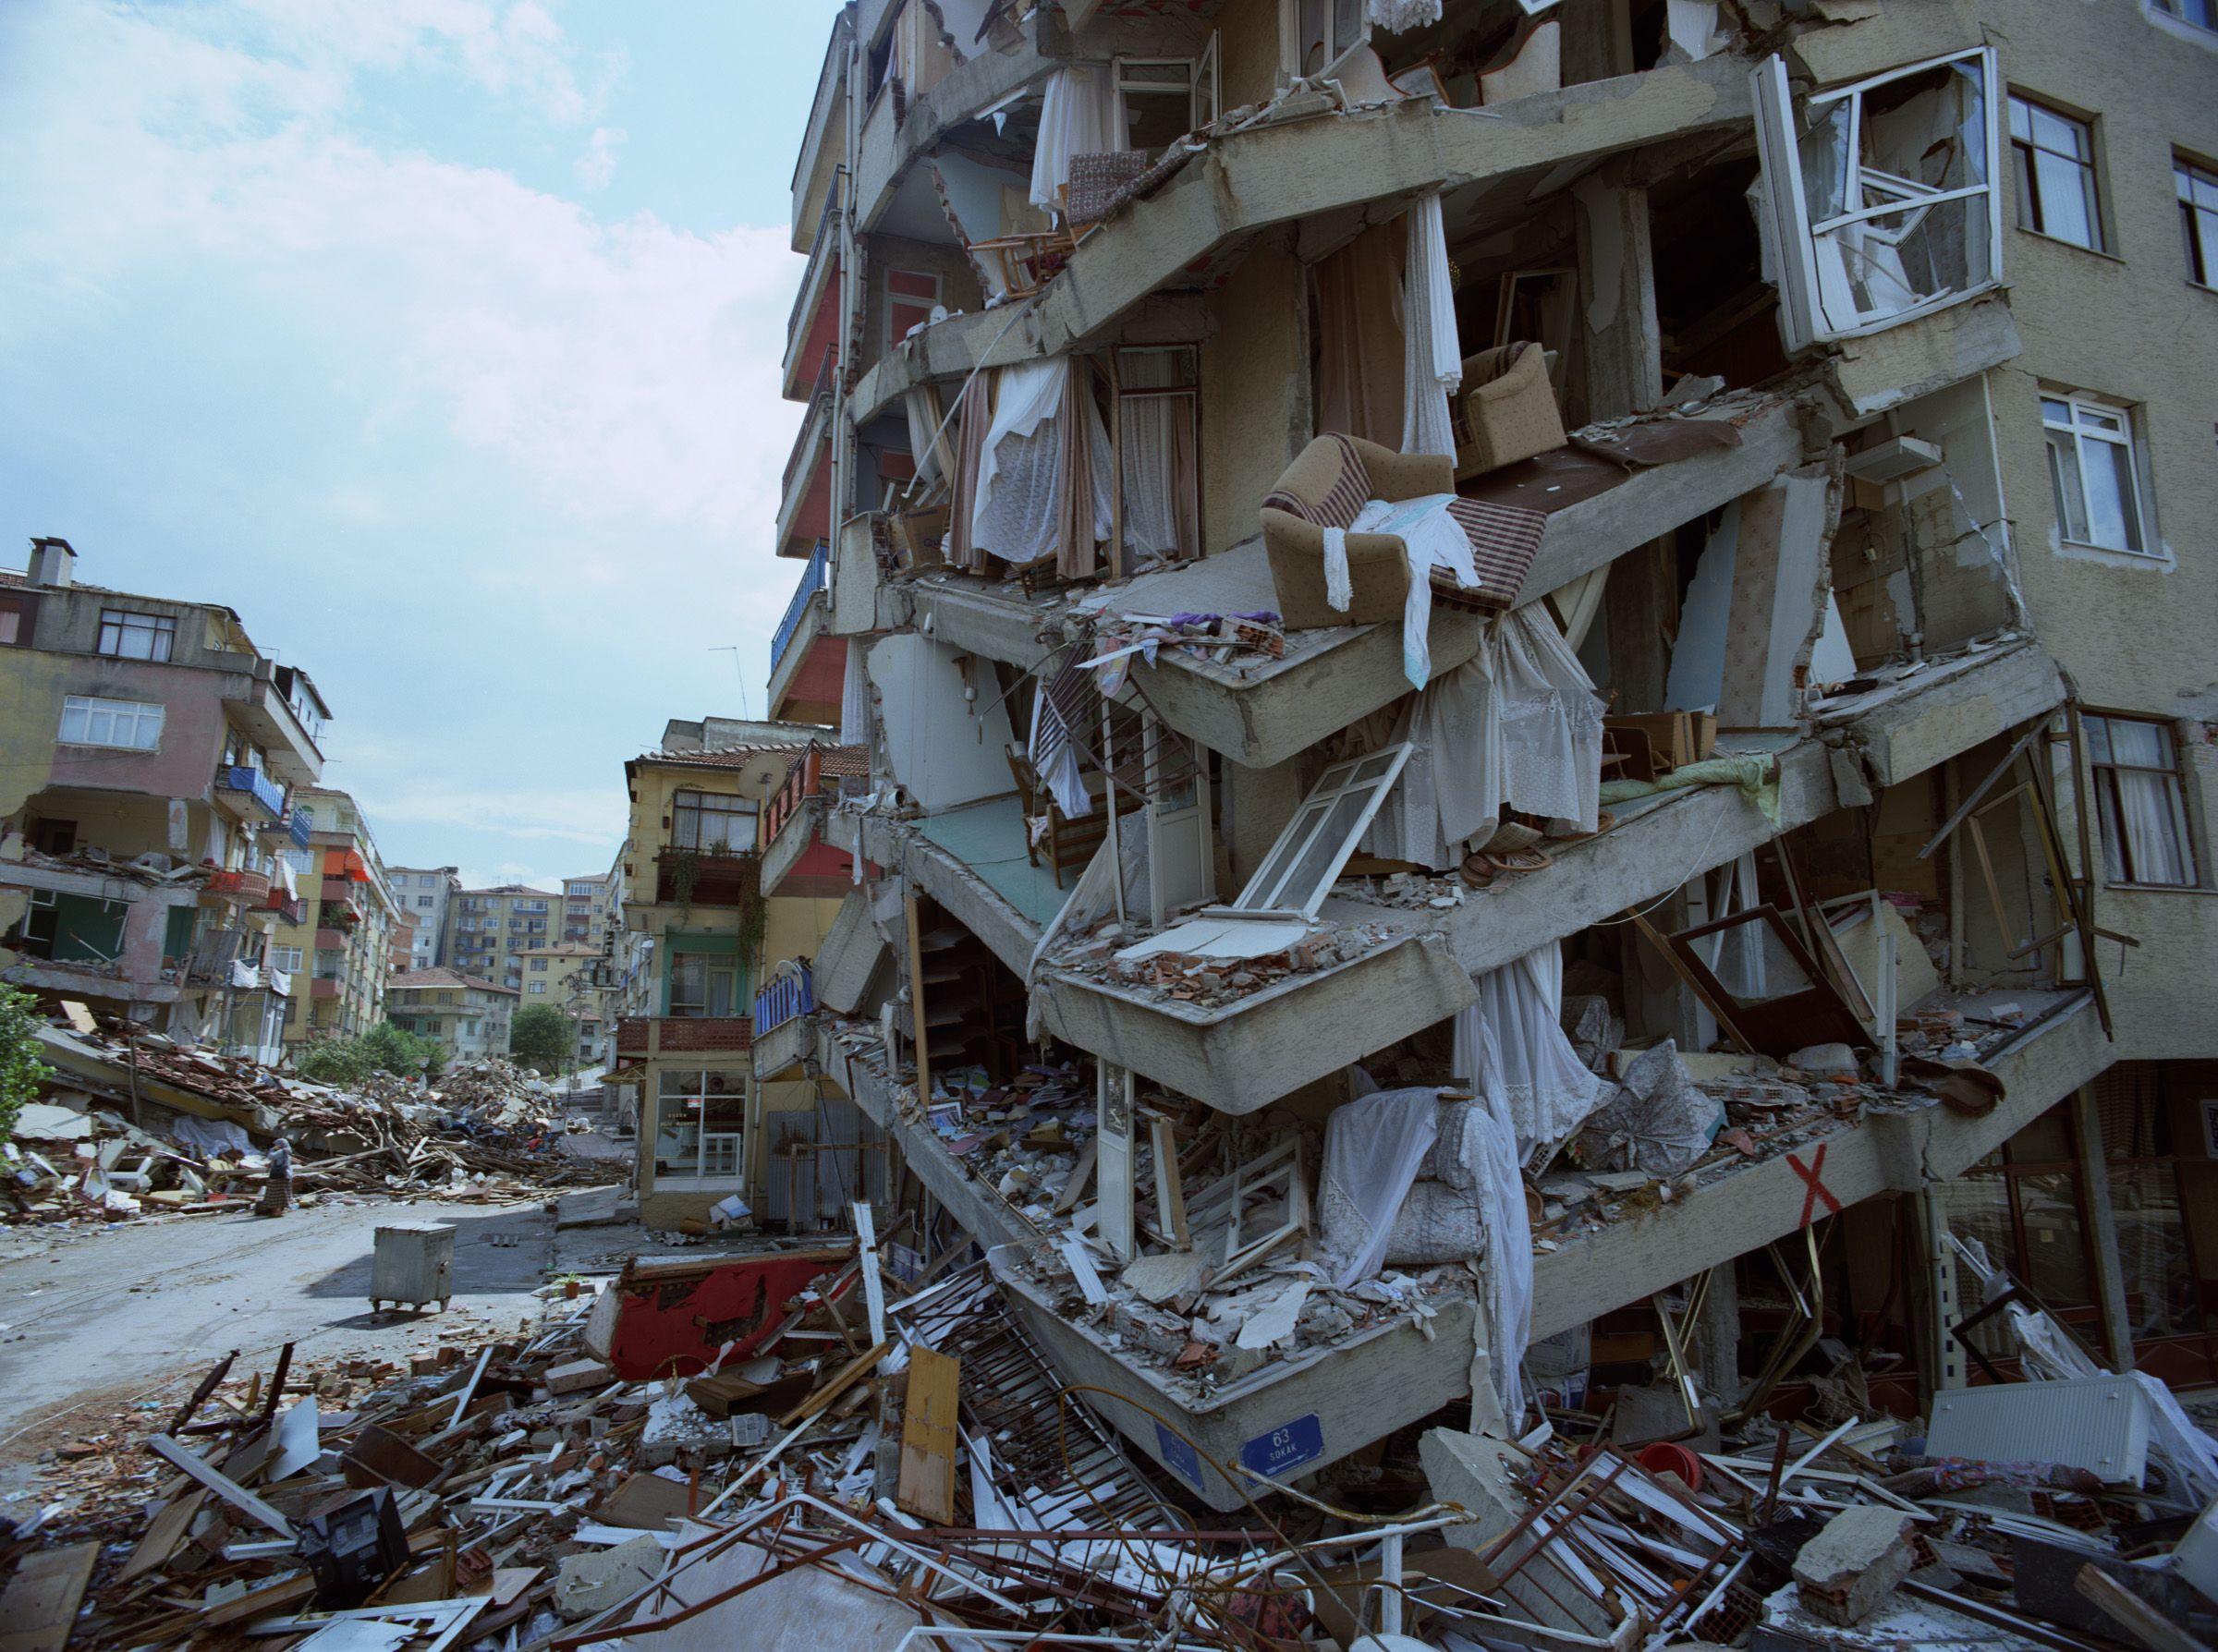 results of an earthquake, Izmir, Turkey | Earthquake damage, Earthquake, Nature